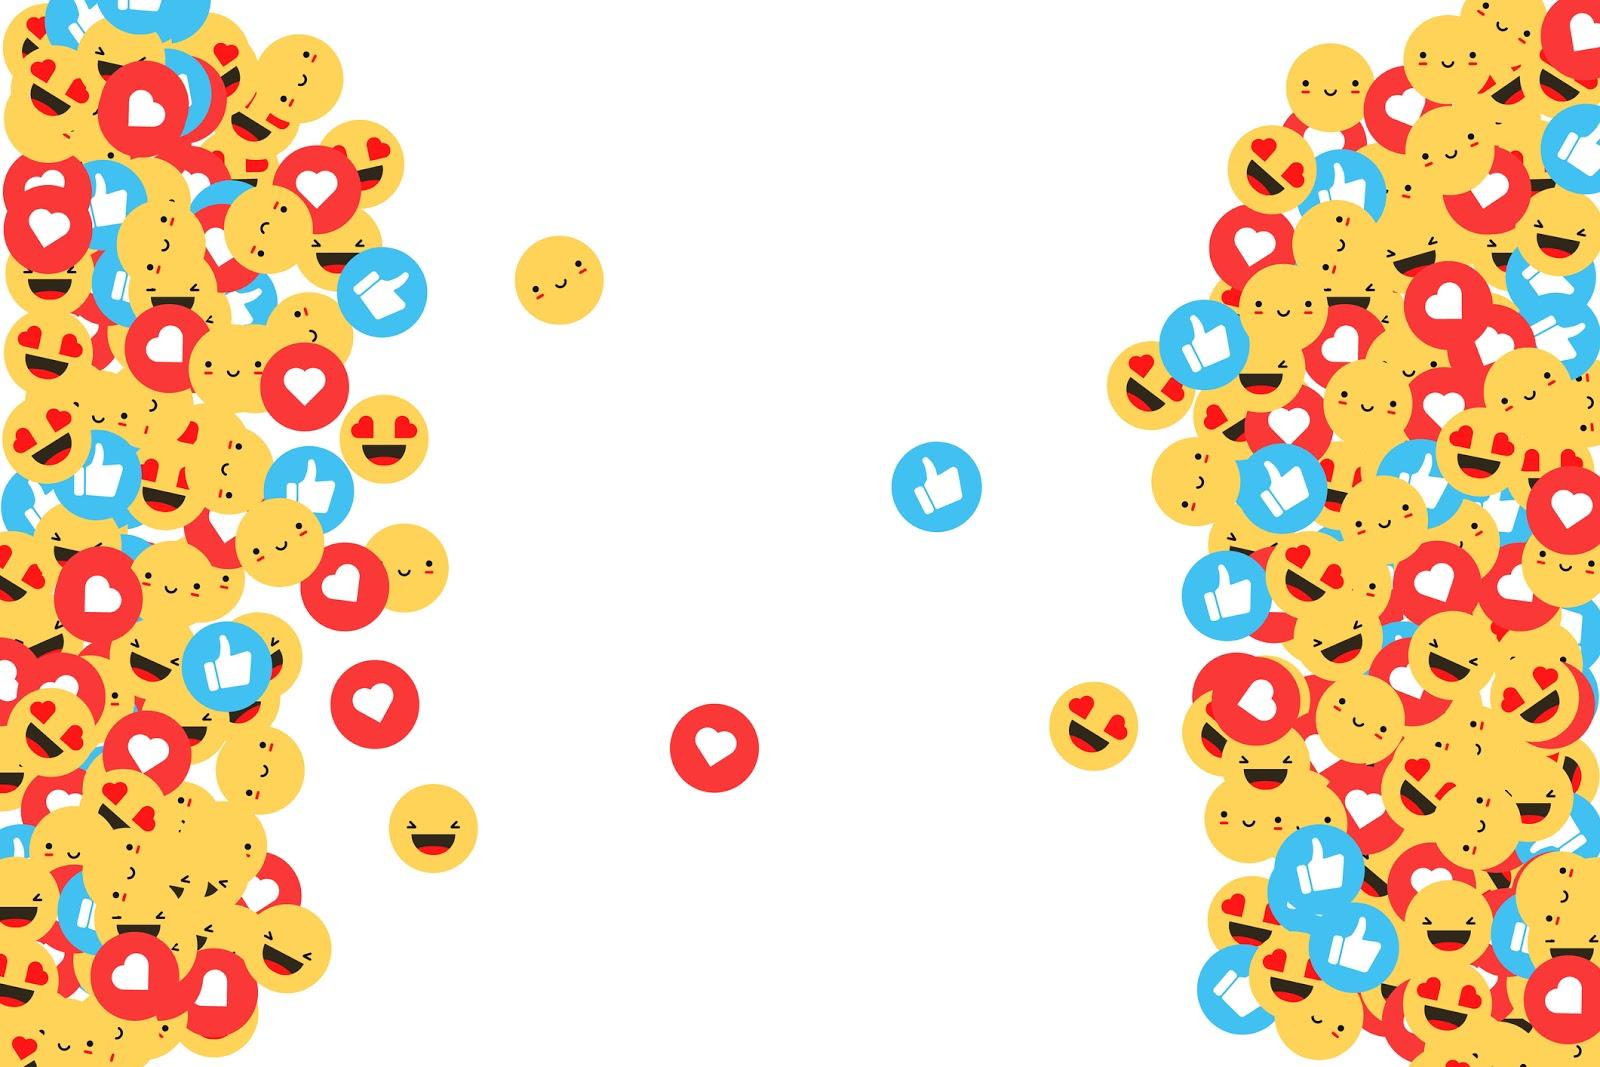 collage of emoji's for Twitter & Facebook